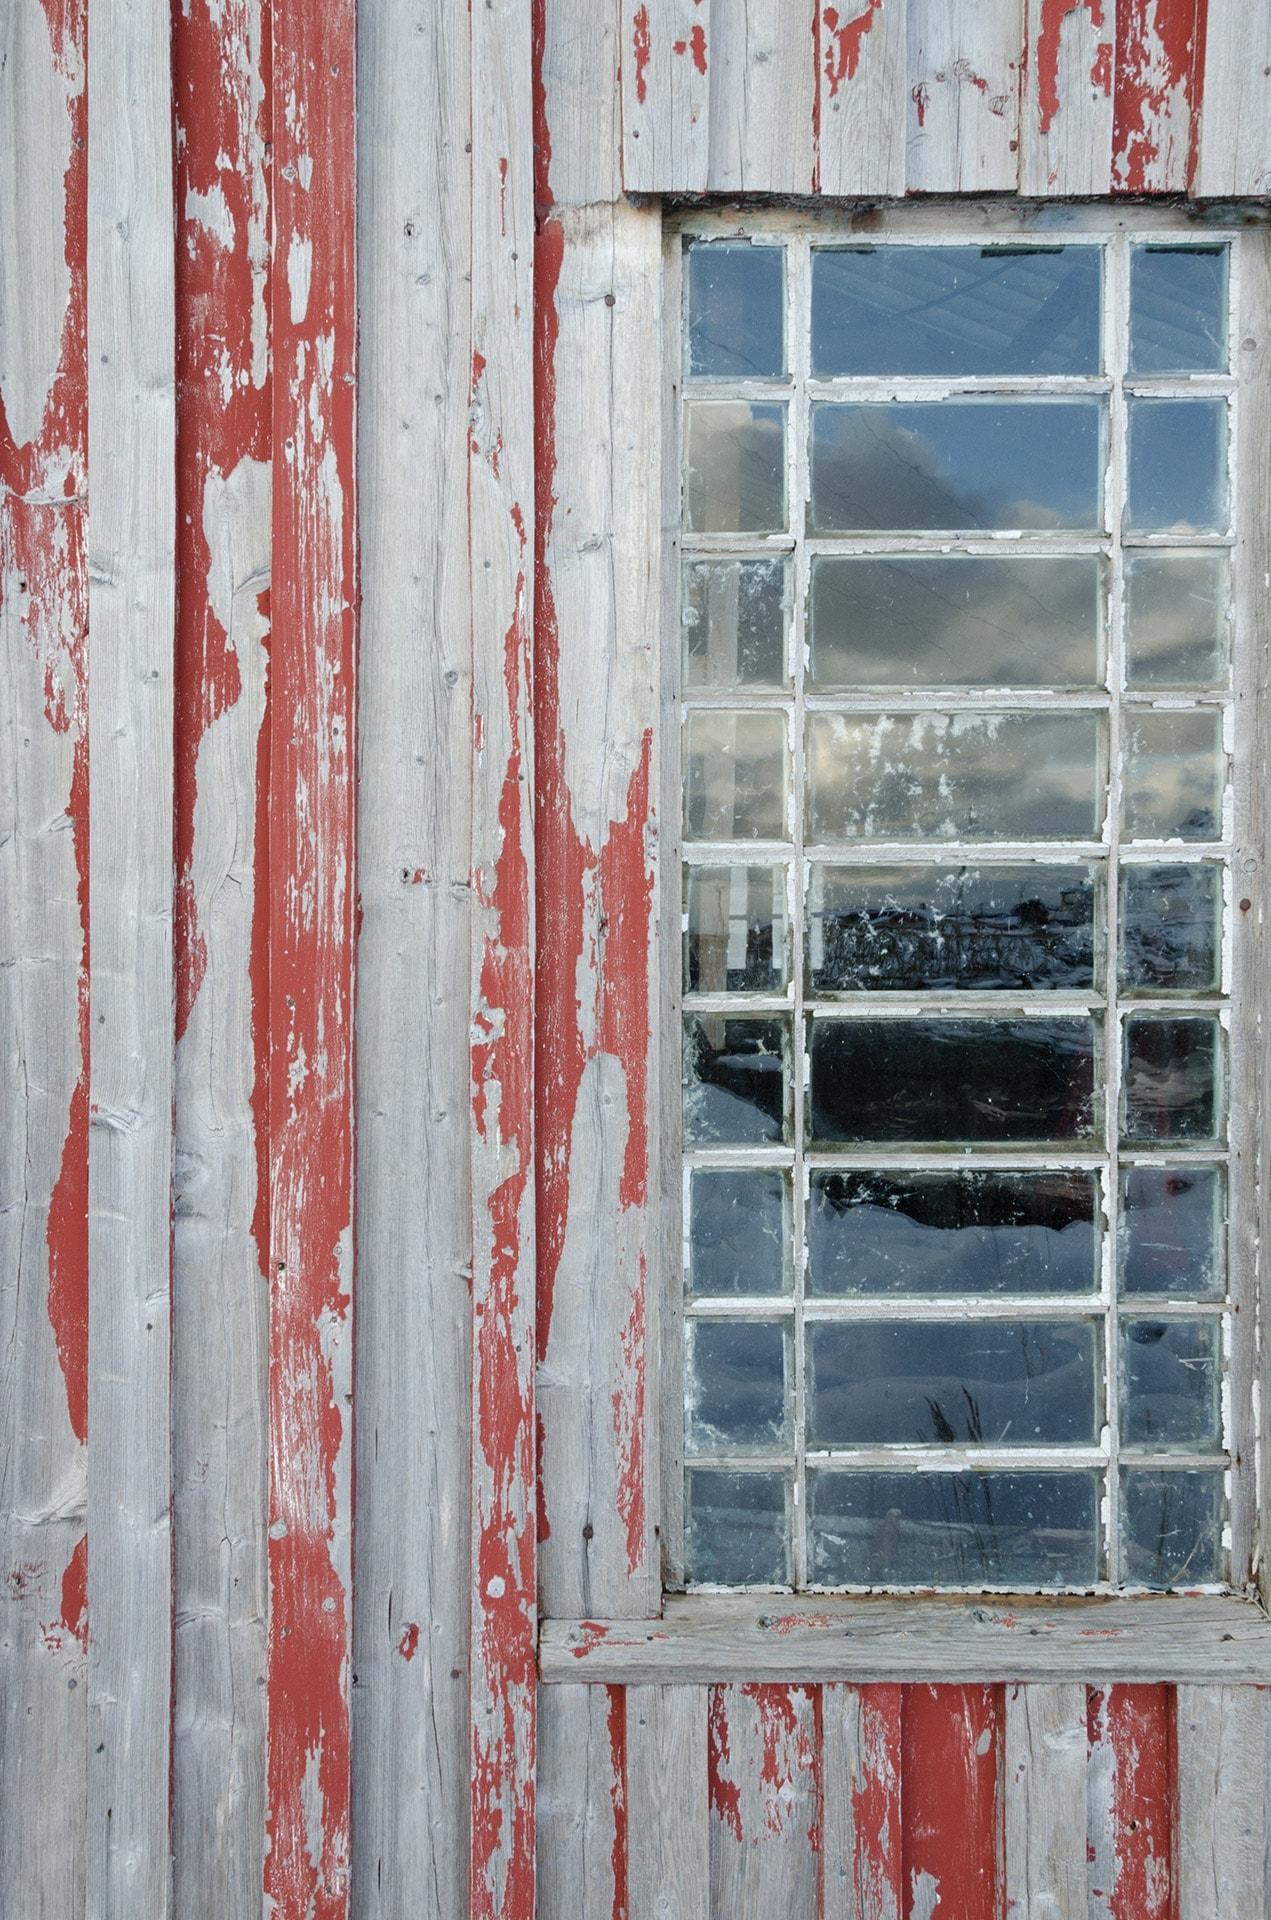 artnorama - Reflecting Windows